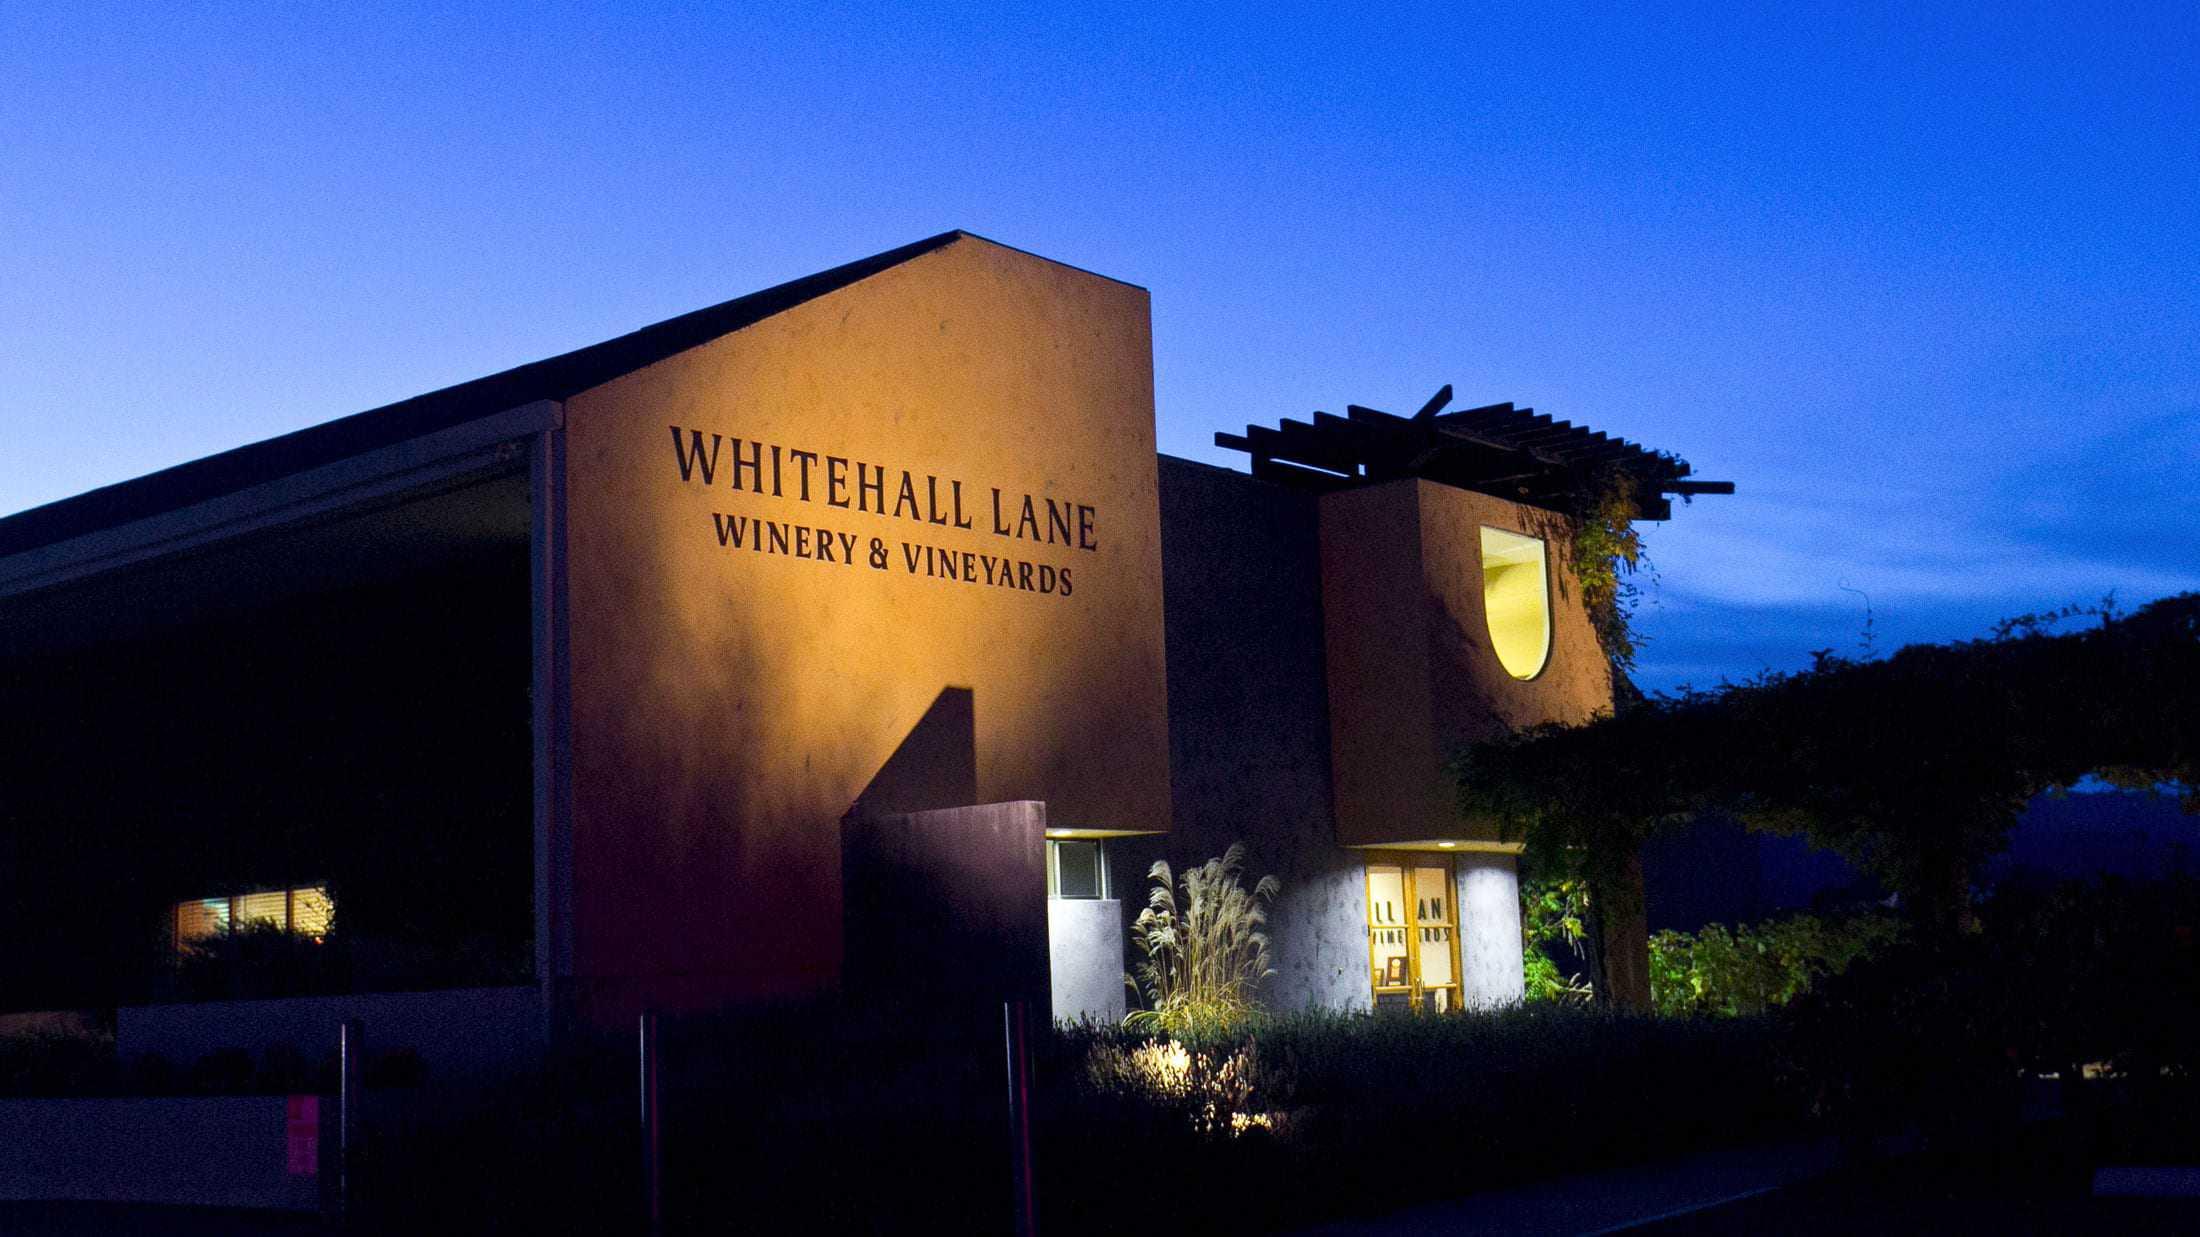 Whitehall Lane Winery and Vineyards